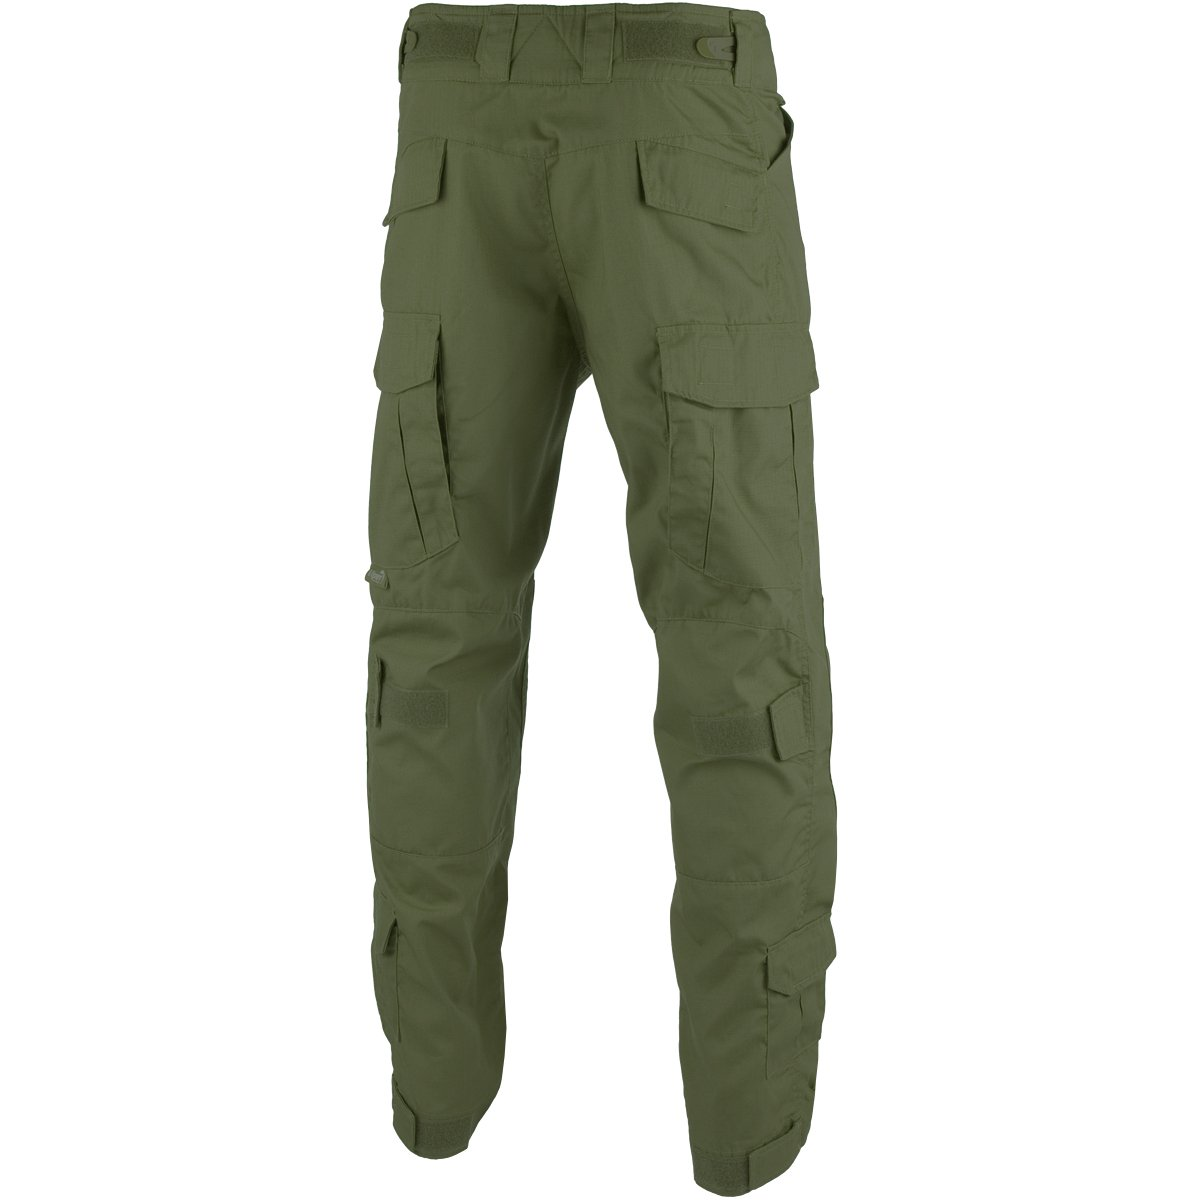 Viper Tactique Elite Hommes Pantalon Vert